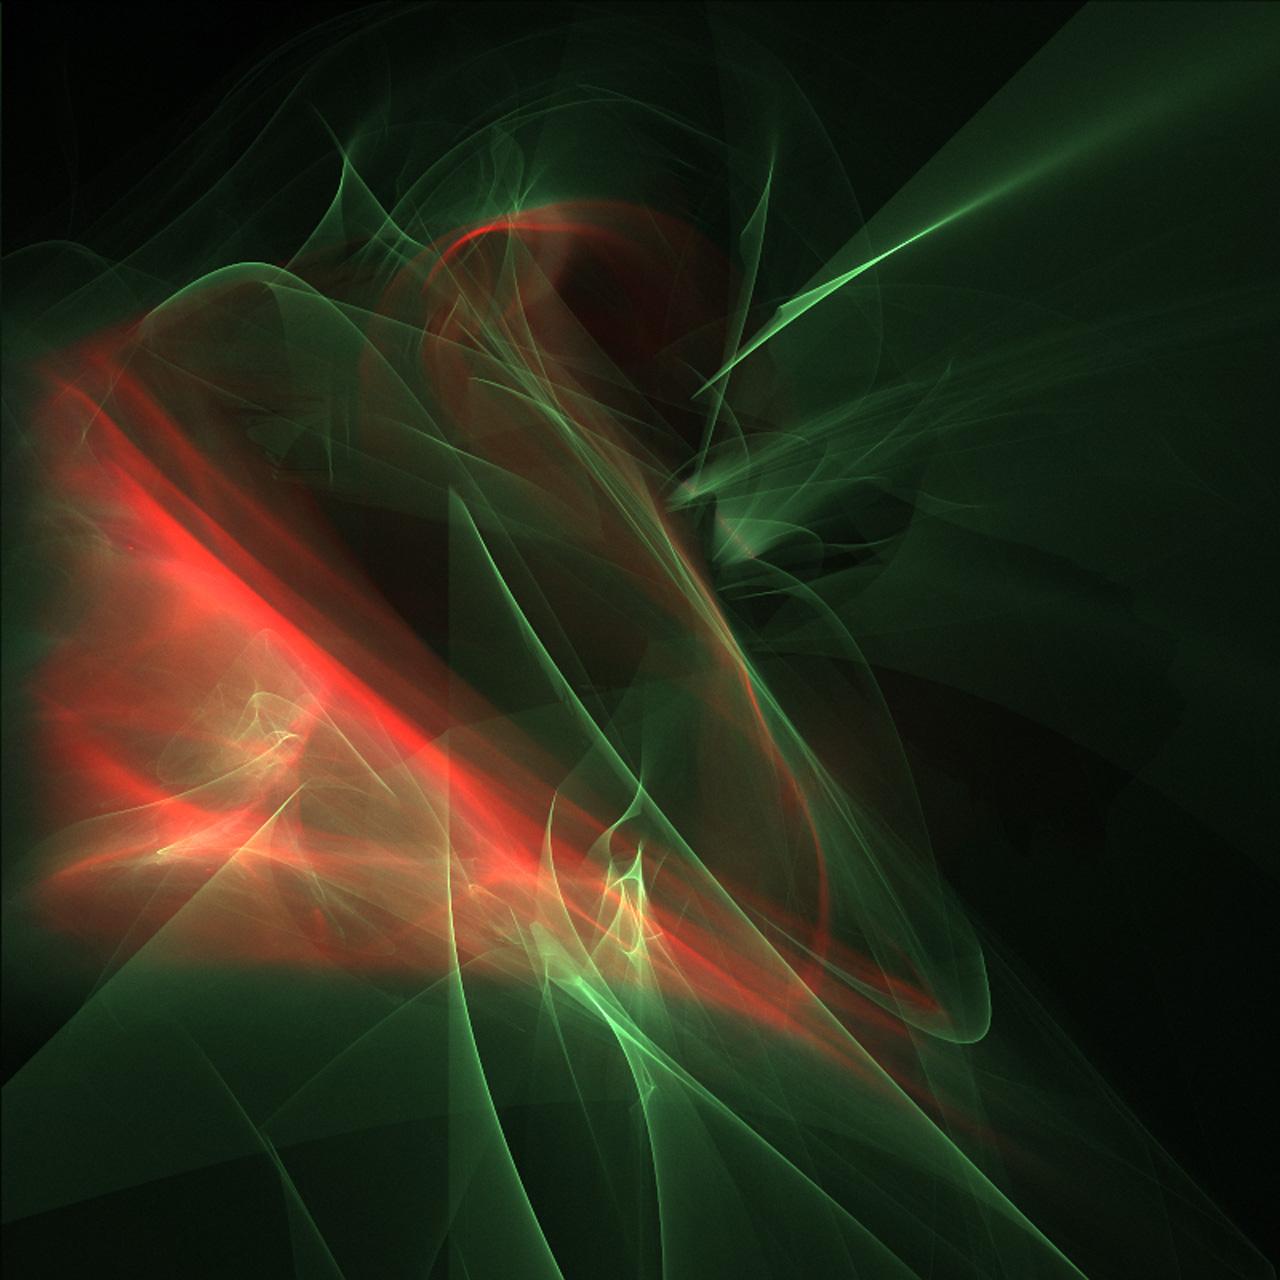 software_buddhabrot_image36